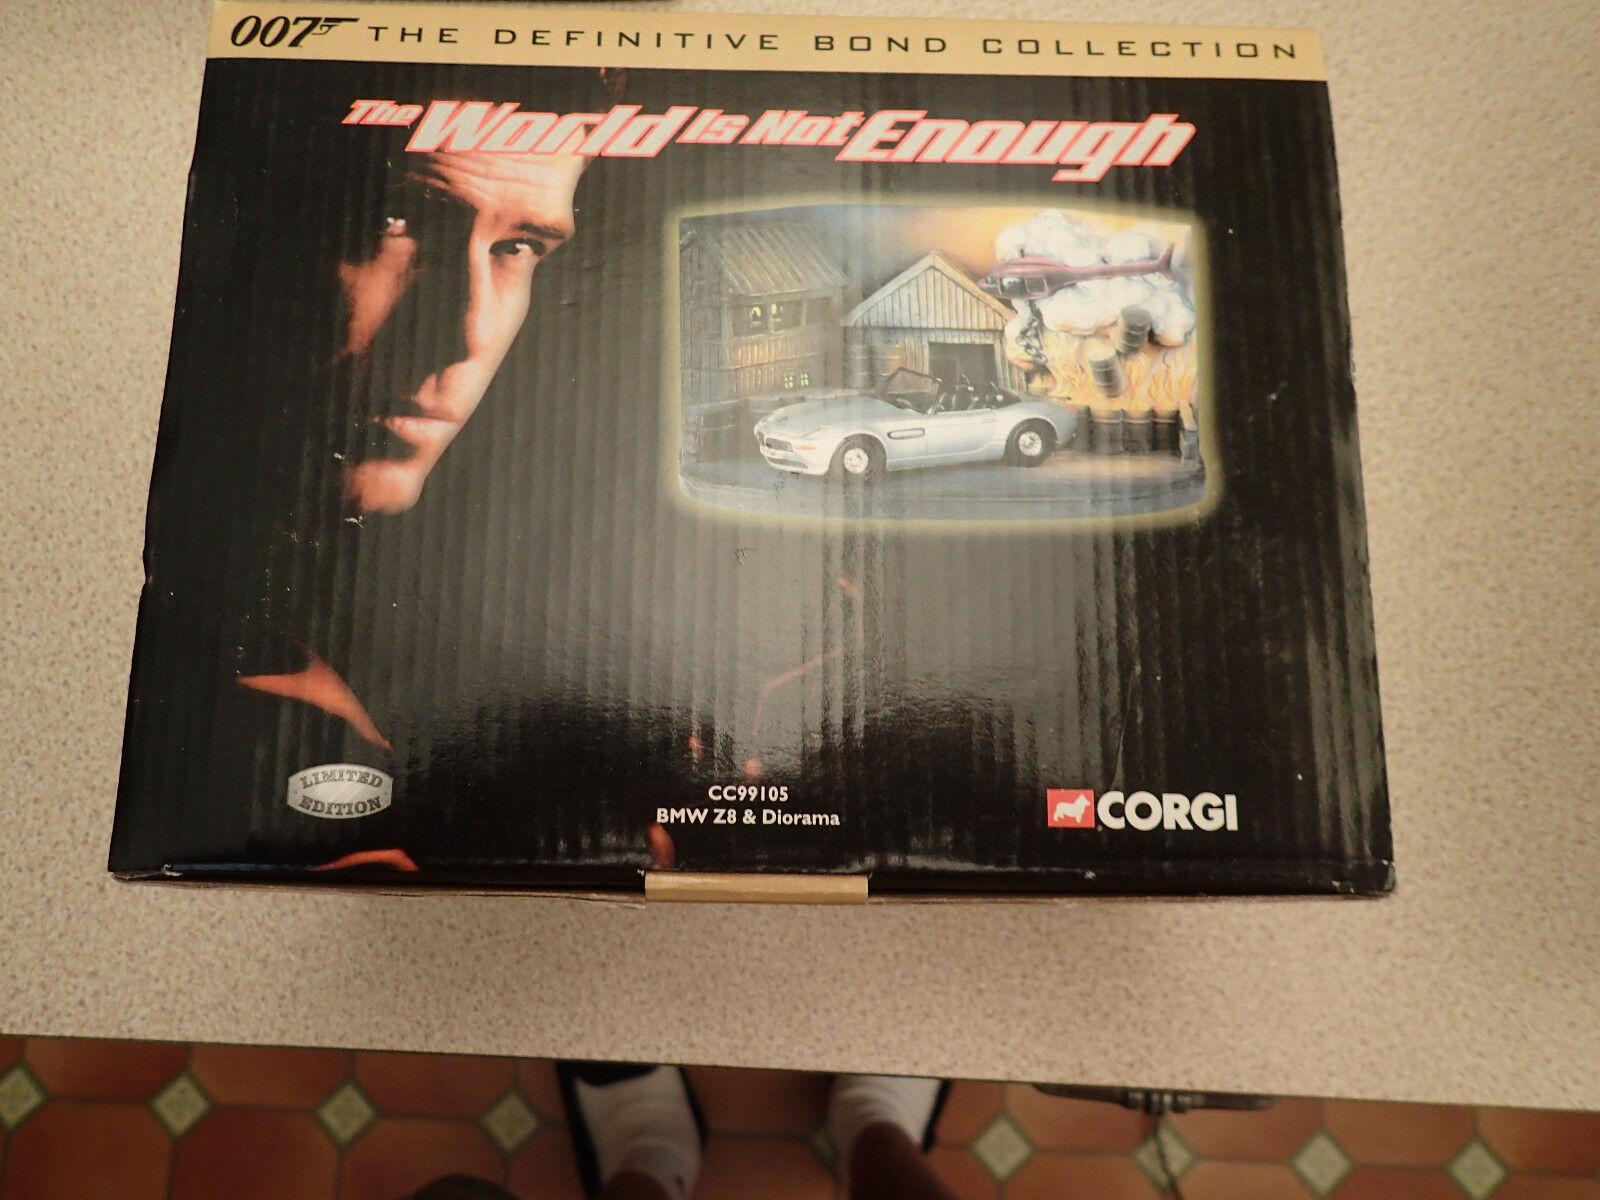 Ltd Edn Corgi James Bond CC99105 BMW Z8 & Diorama  Untouched